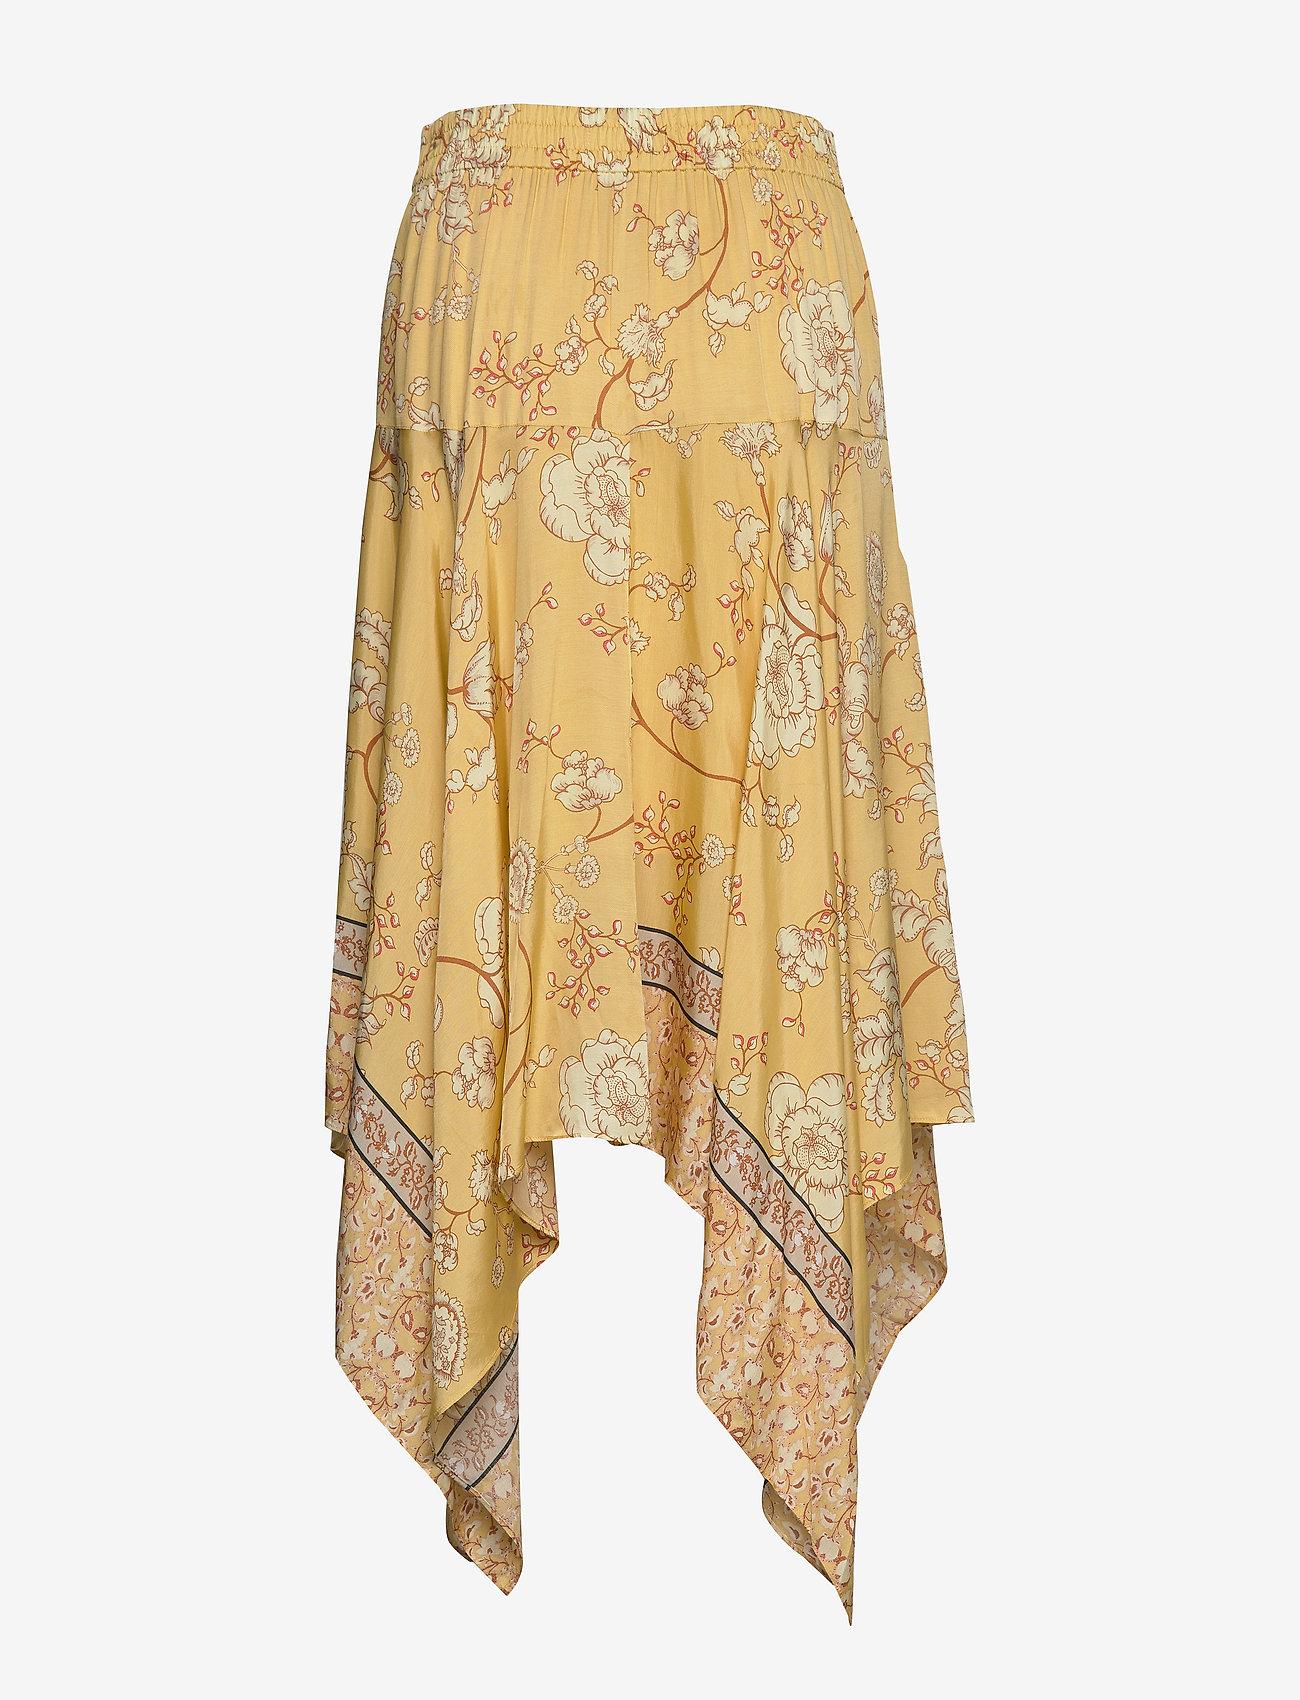 Elba Sunny Skirt (Jojoba) (83.30 €) - MOS MOSH drRMa